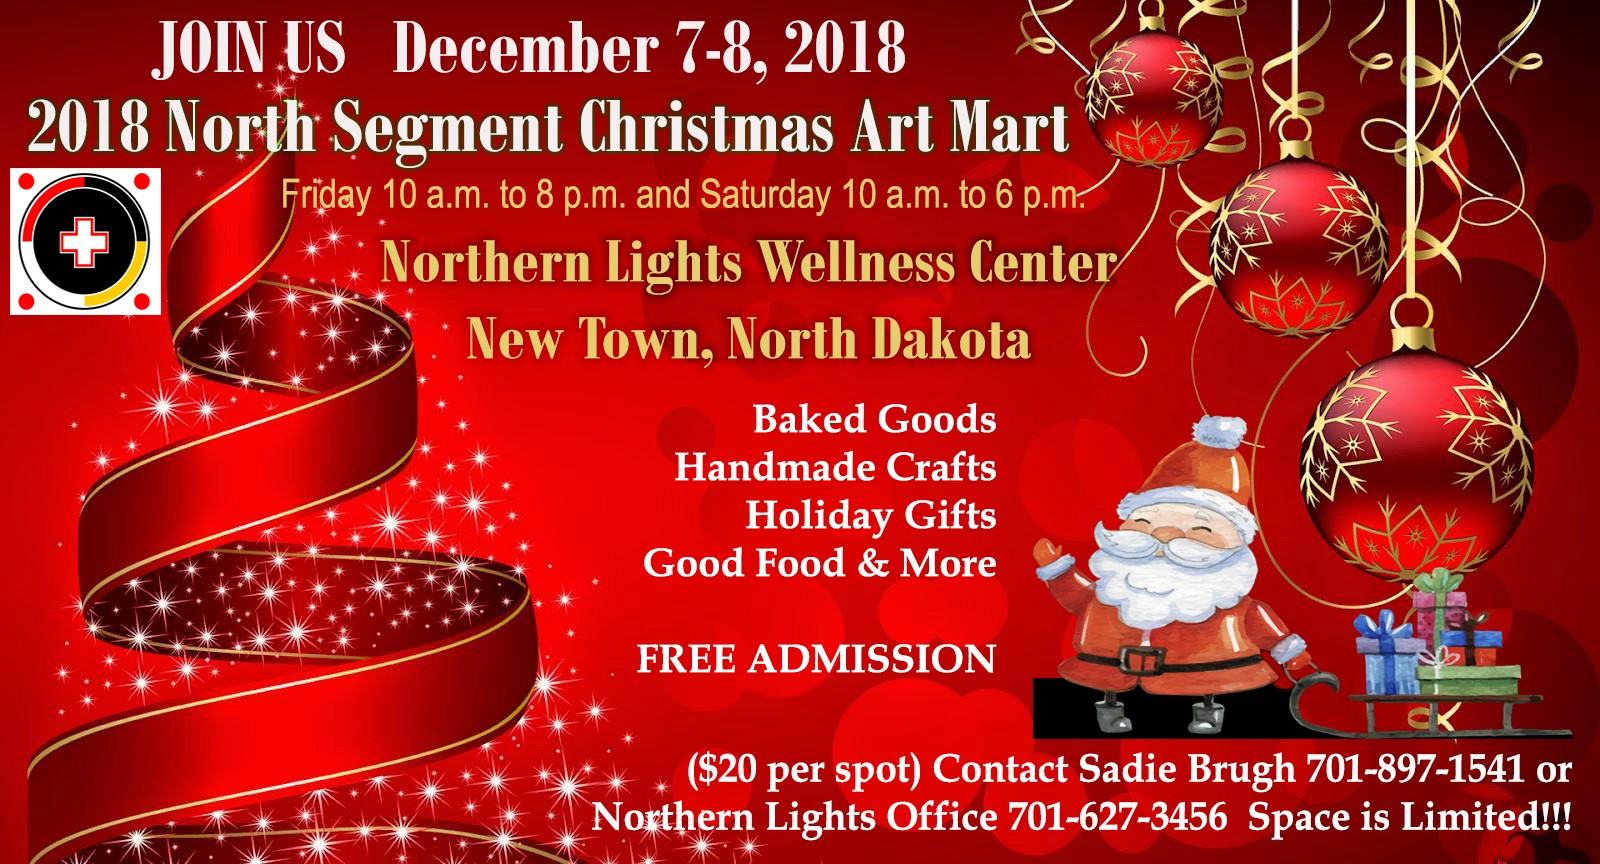 2018 North Segment Christmas Art Mart.jpg